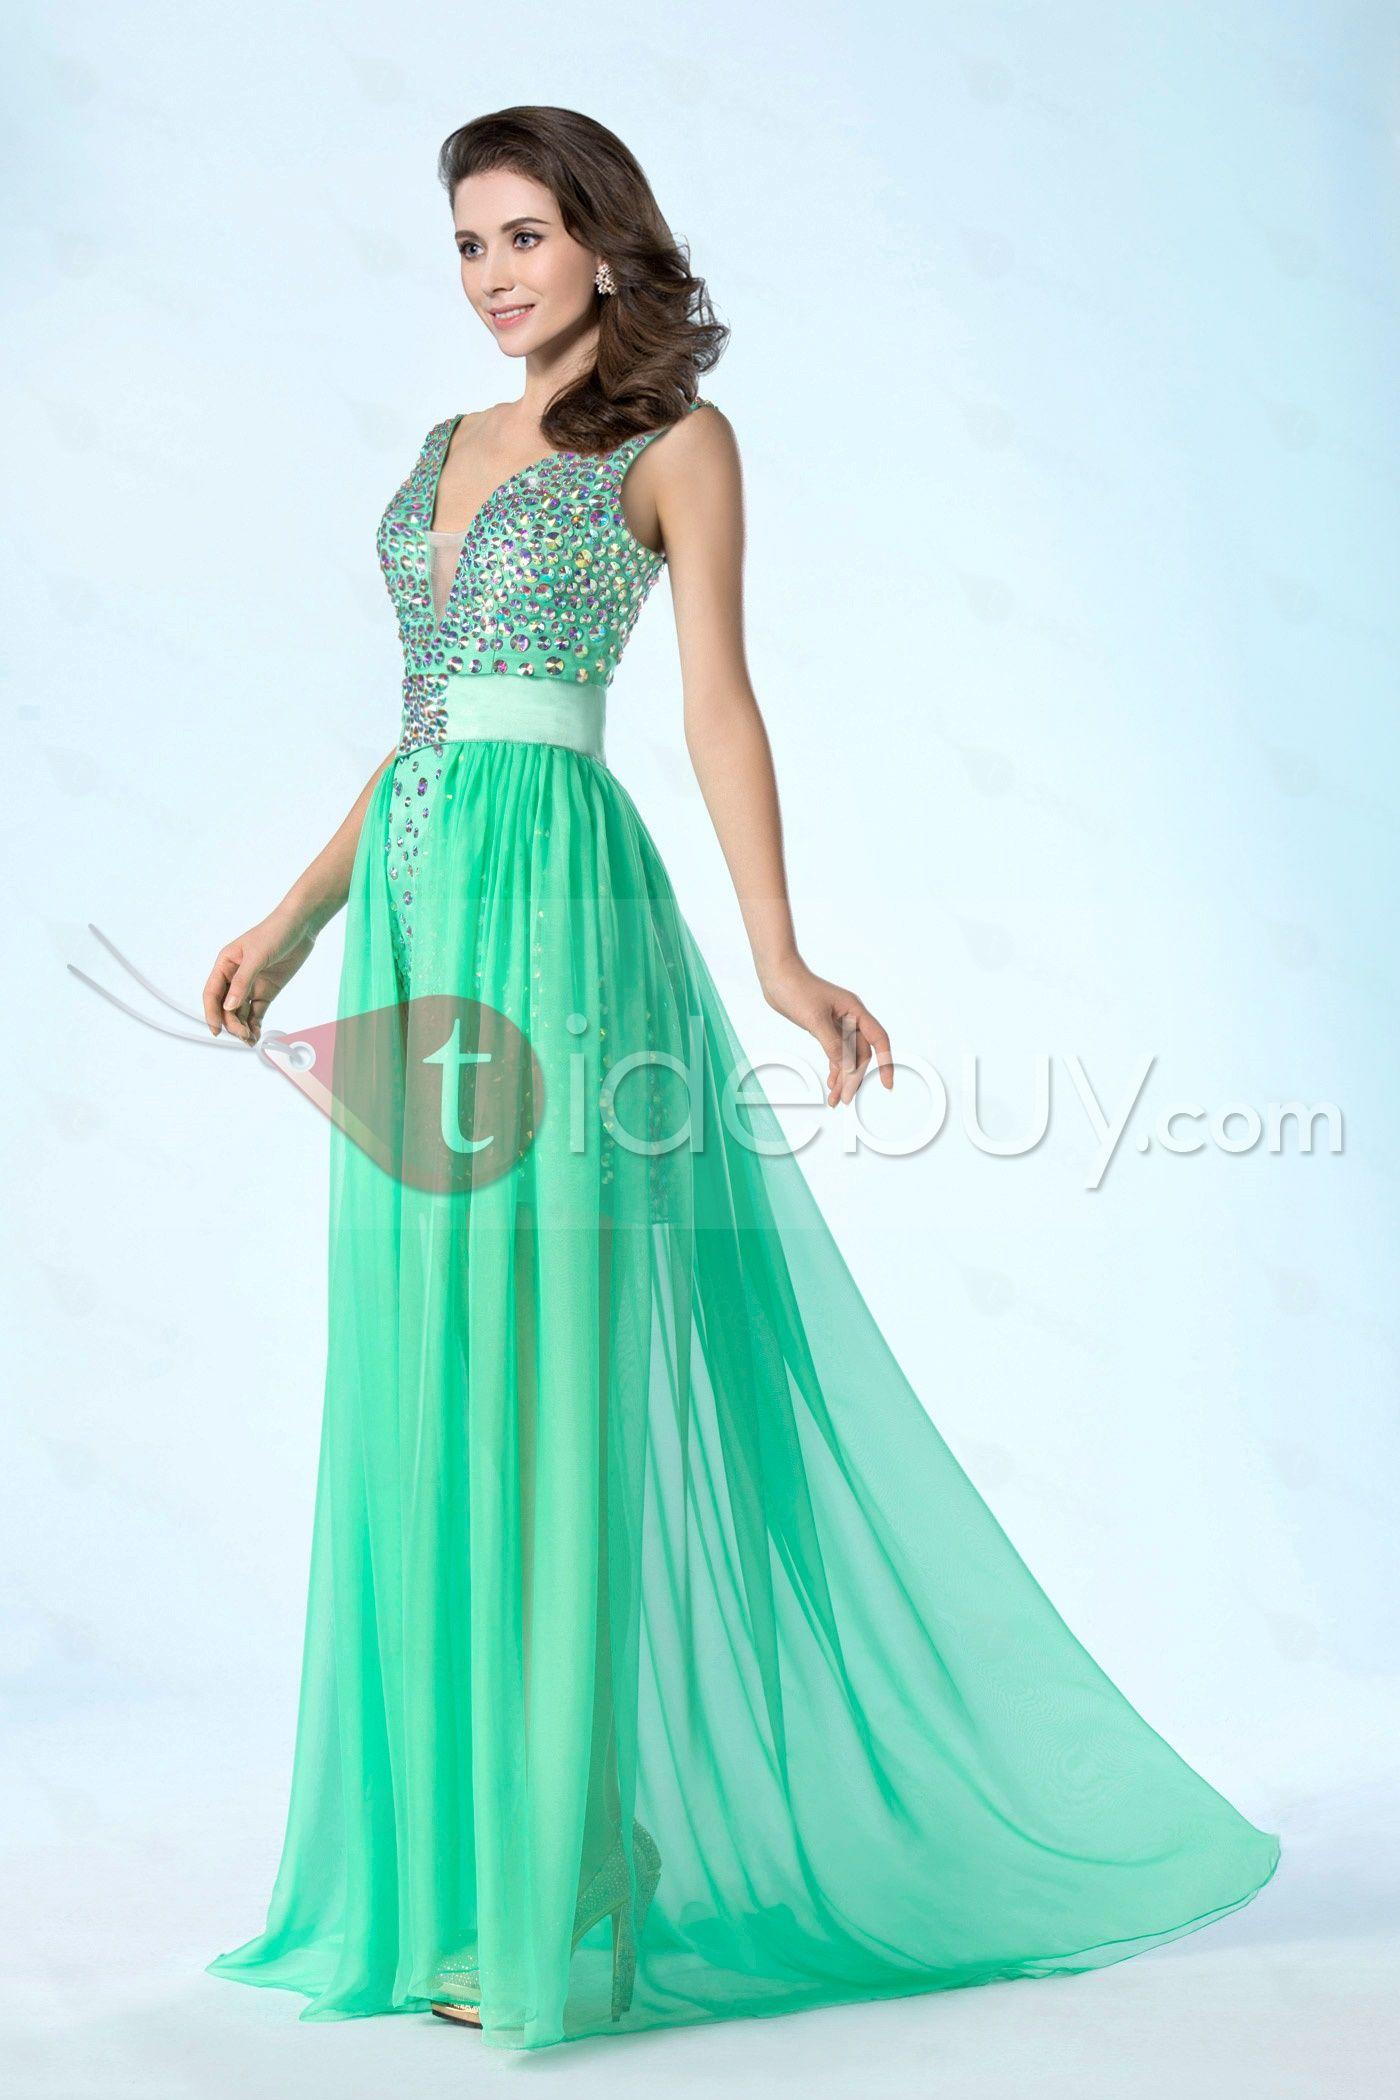 Detachable Column/Sheath V-Neckline Beading Asymmetry Prom Dress